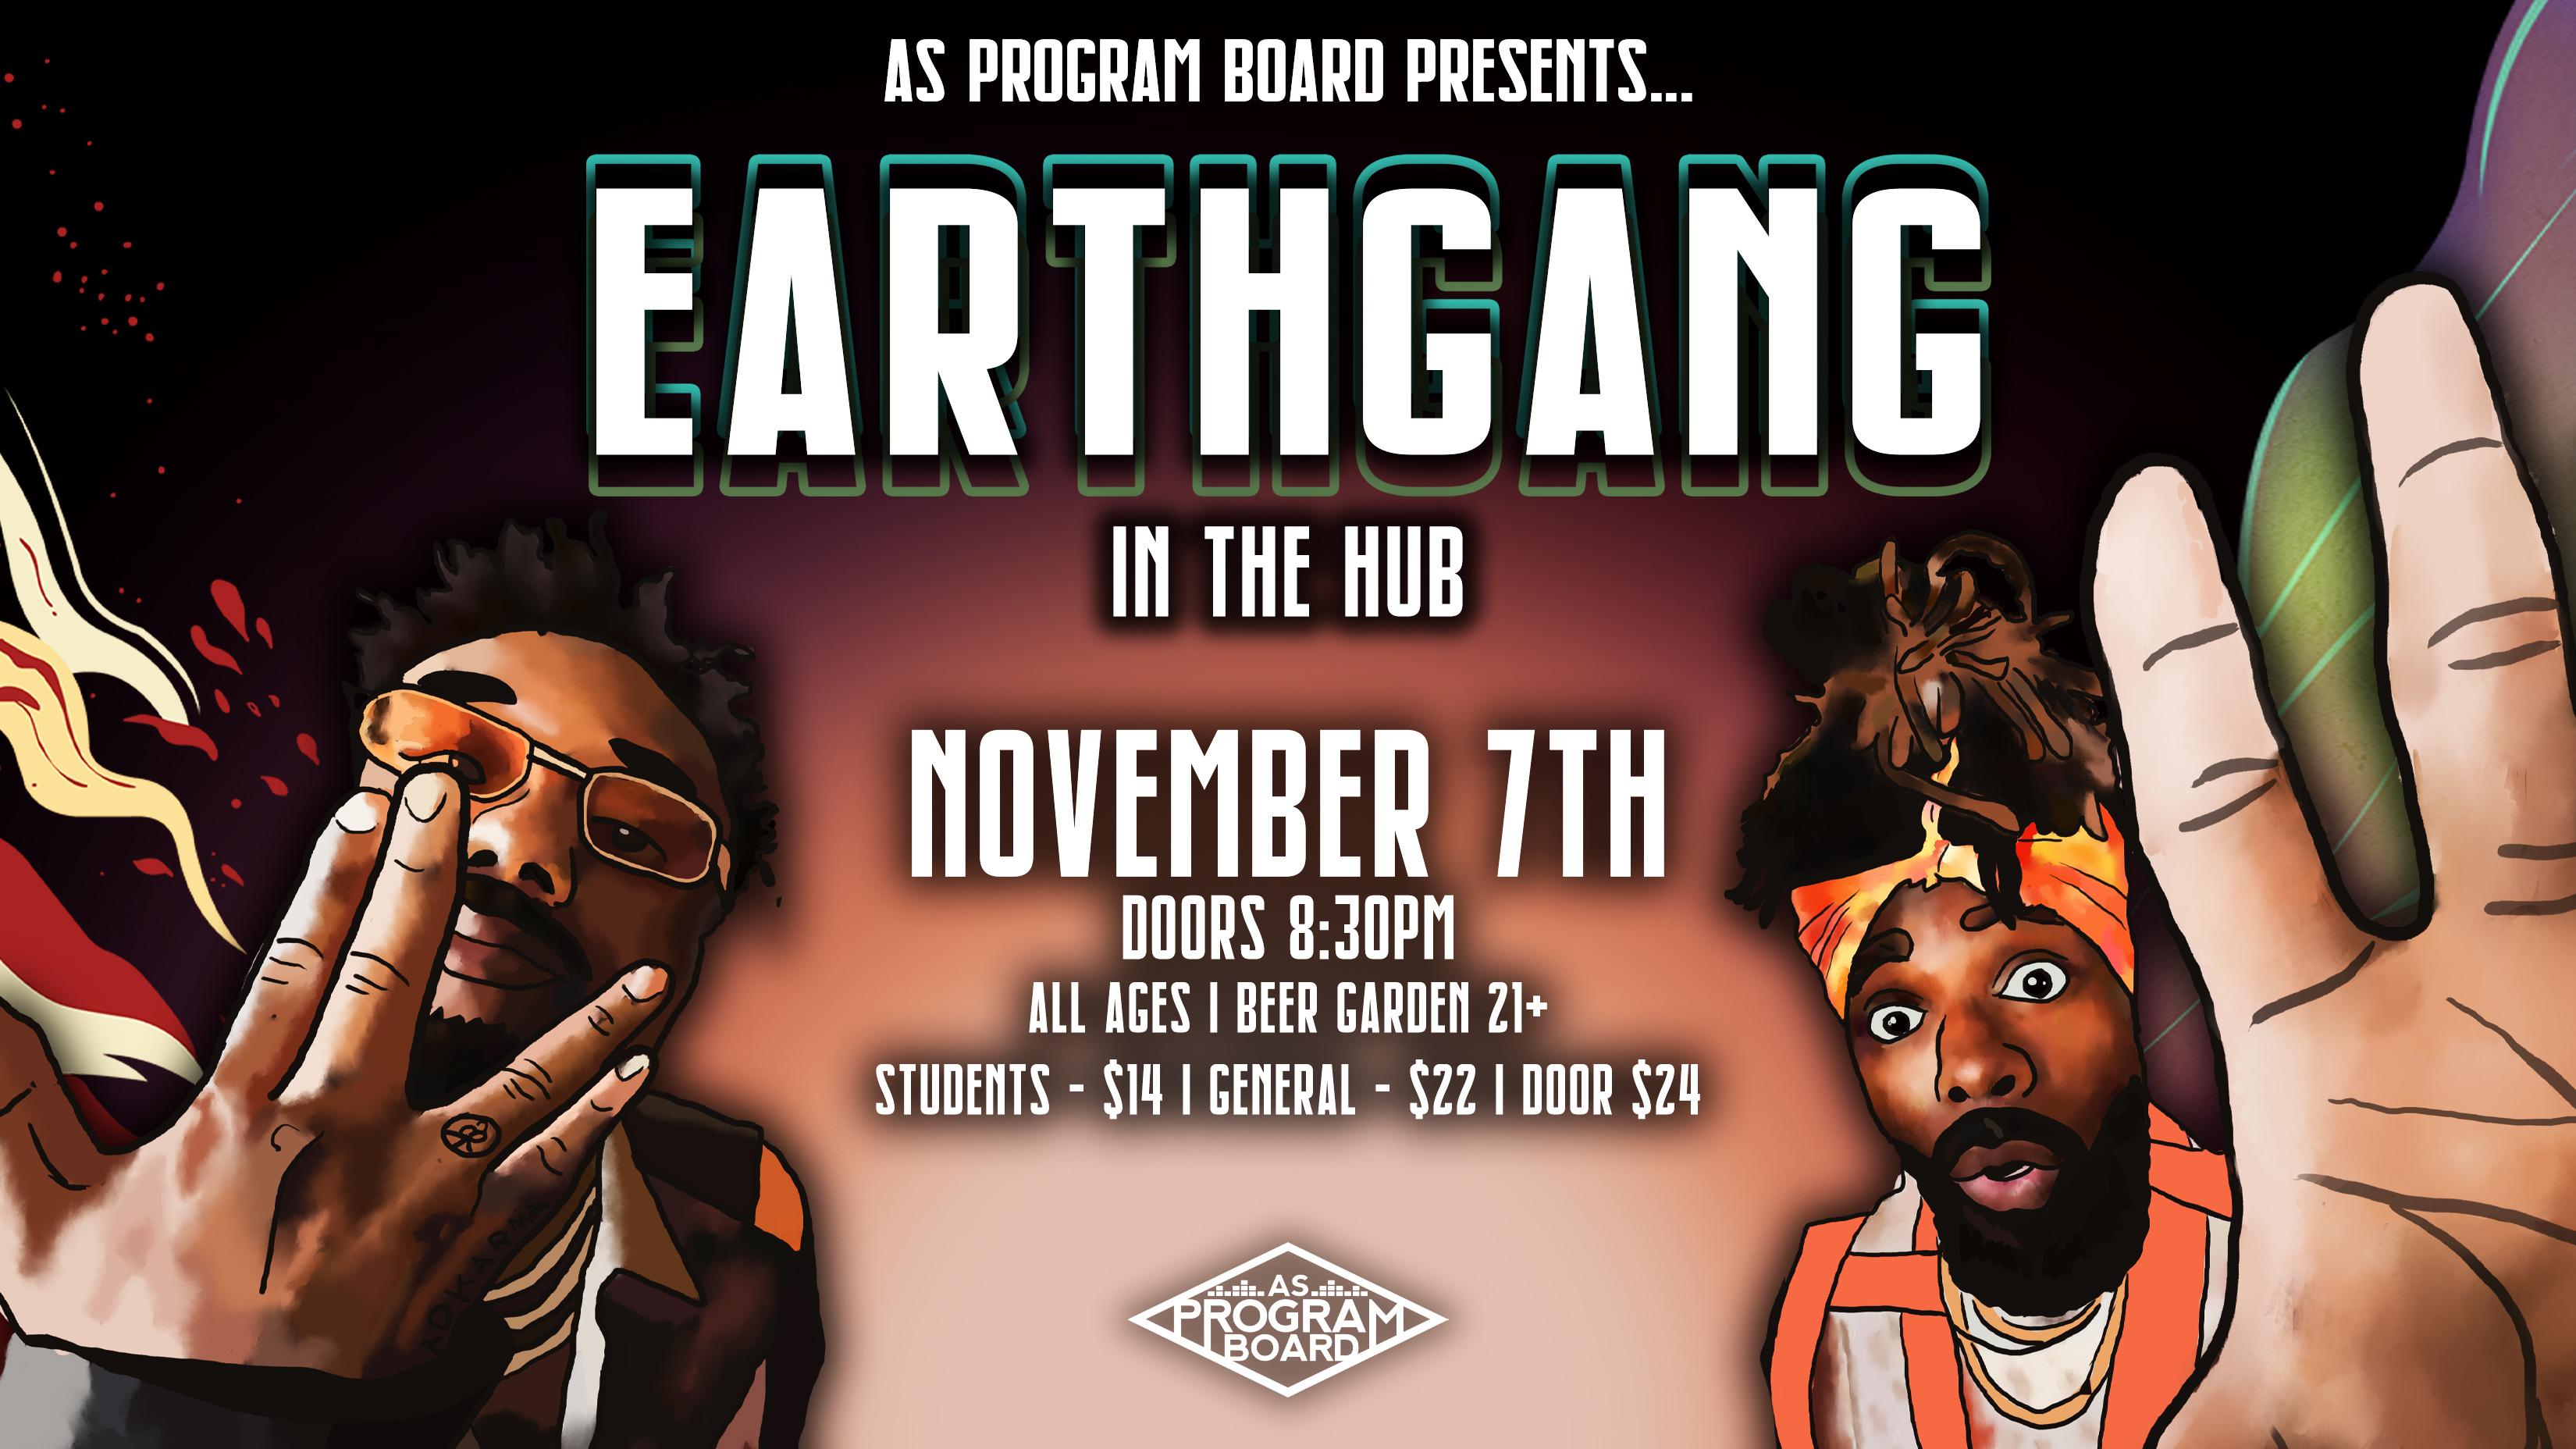 EARTHGANG in the Hub